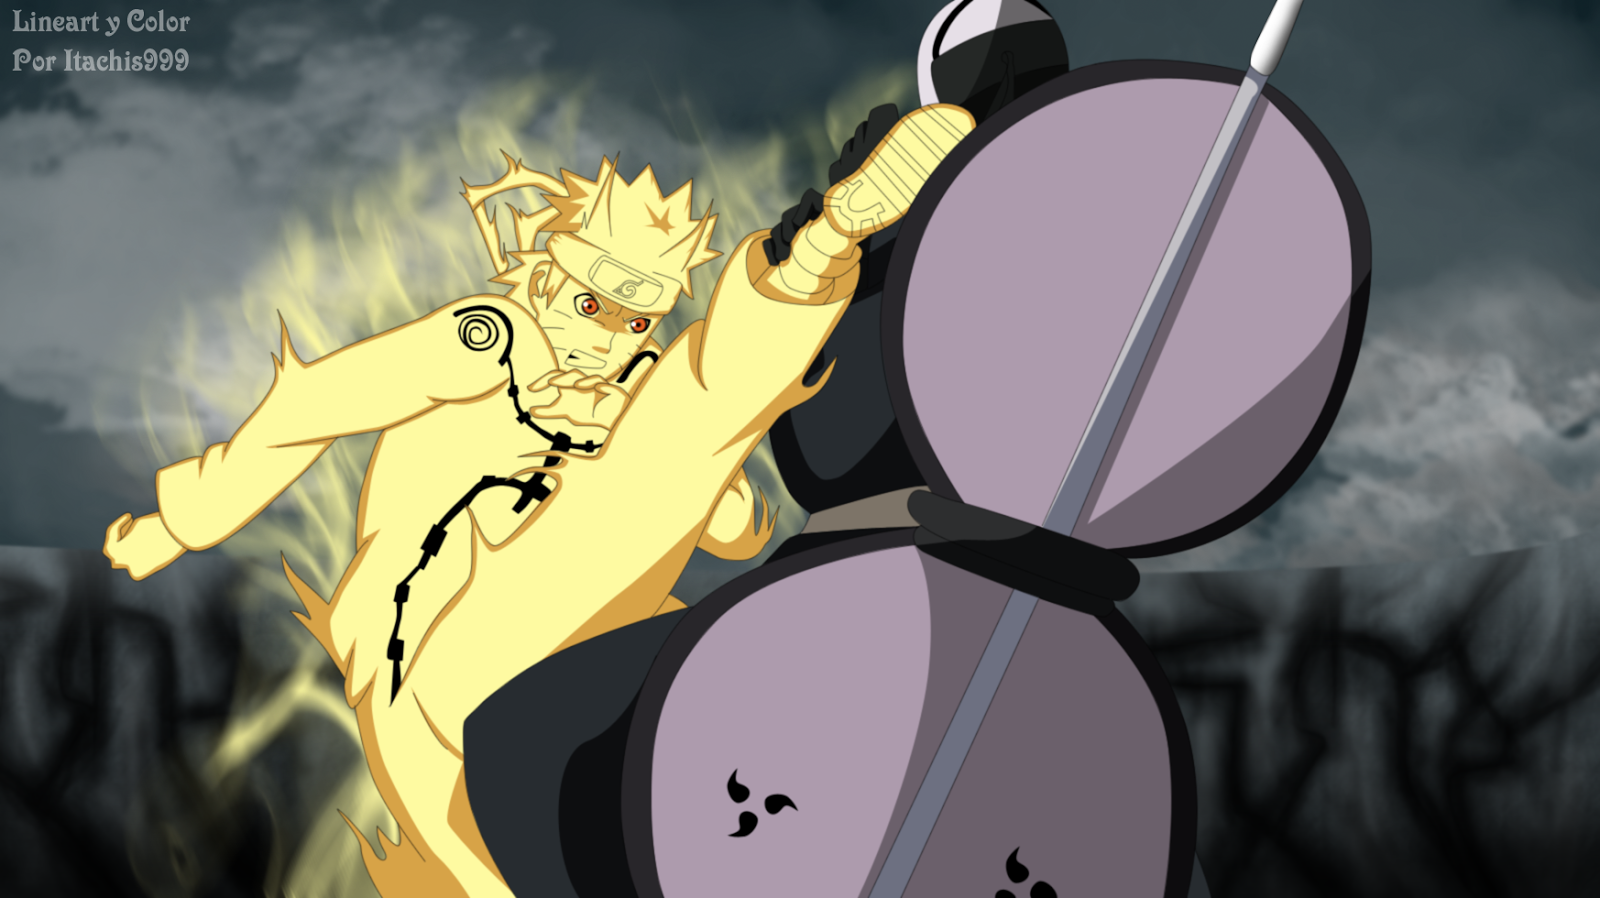 75+] Naruto Tobi Wallpaper on WallpaperSafari